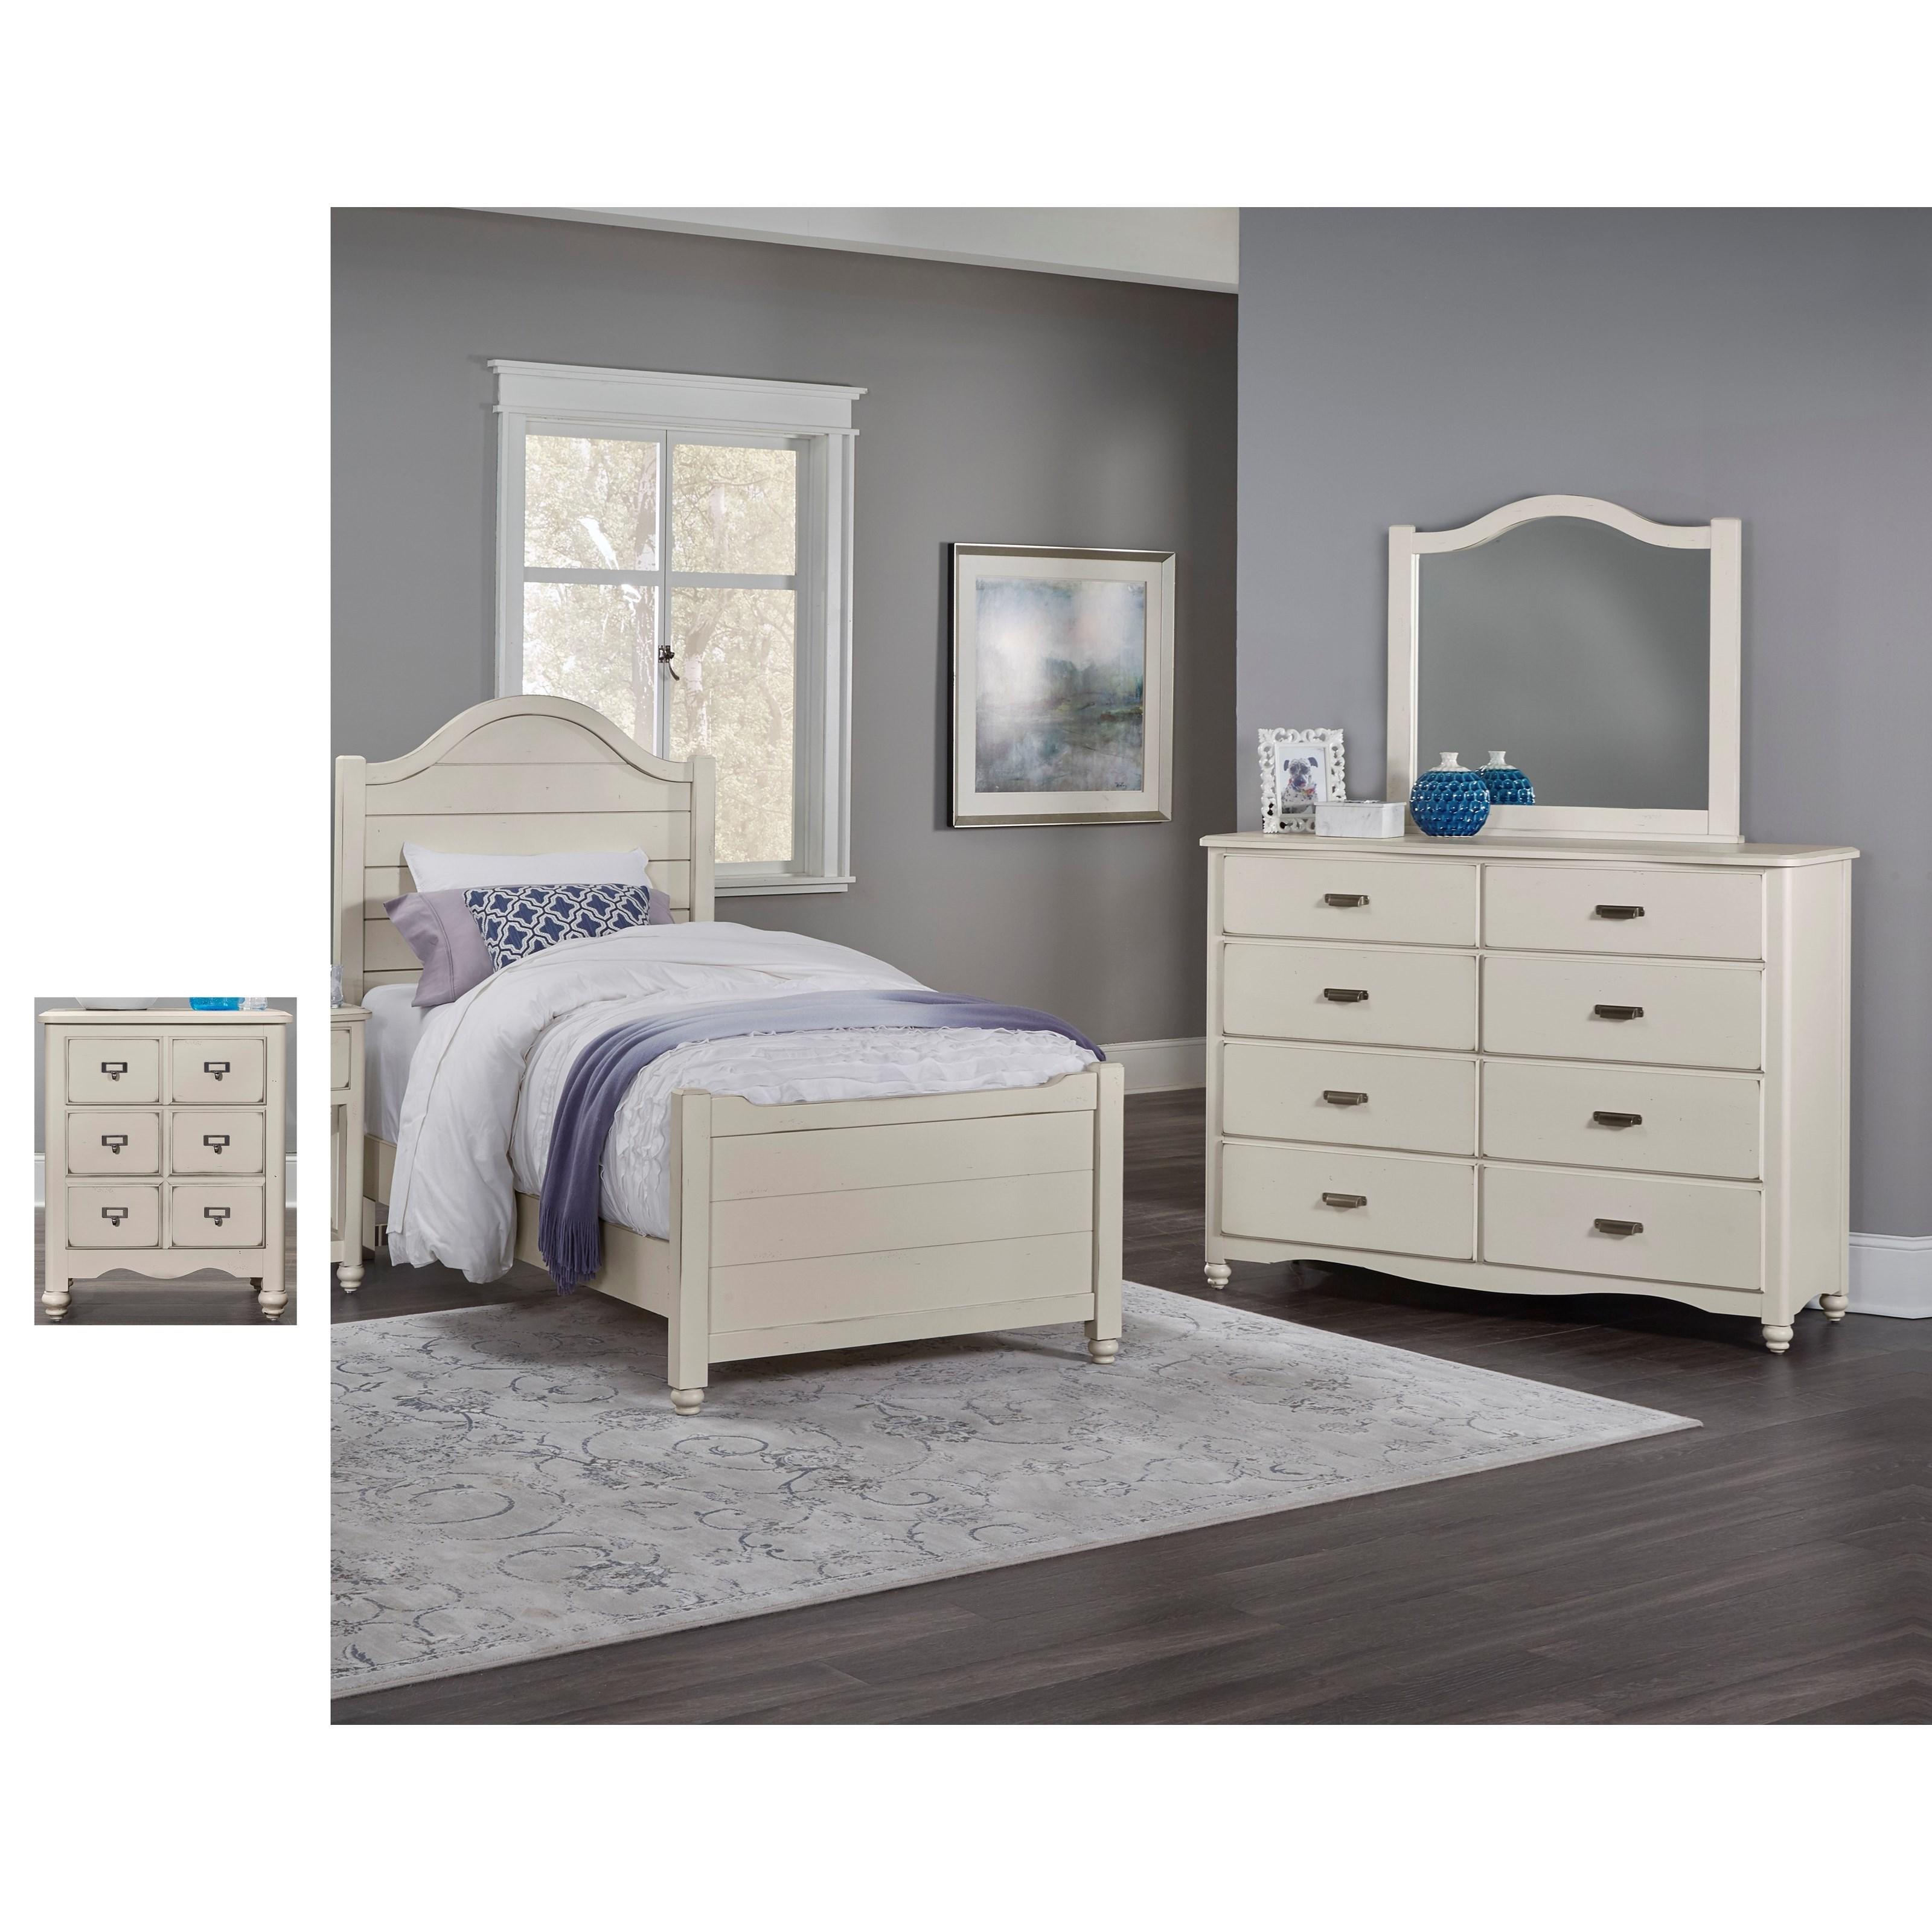 Vaughan Bassett American Maple Twin Bedroom Group - Item Number: 404 T Bedroom Group 2